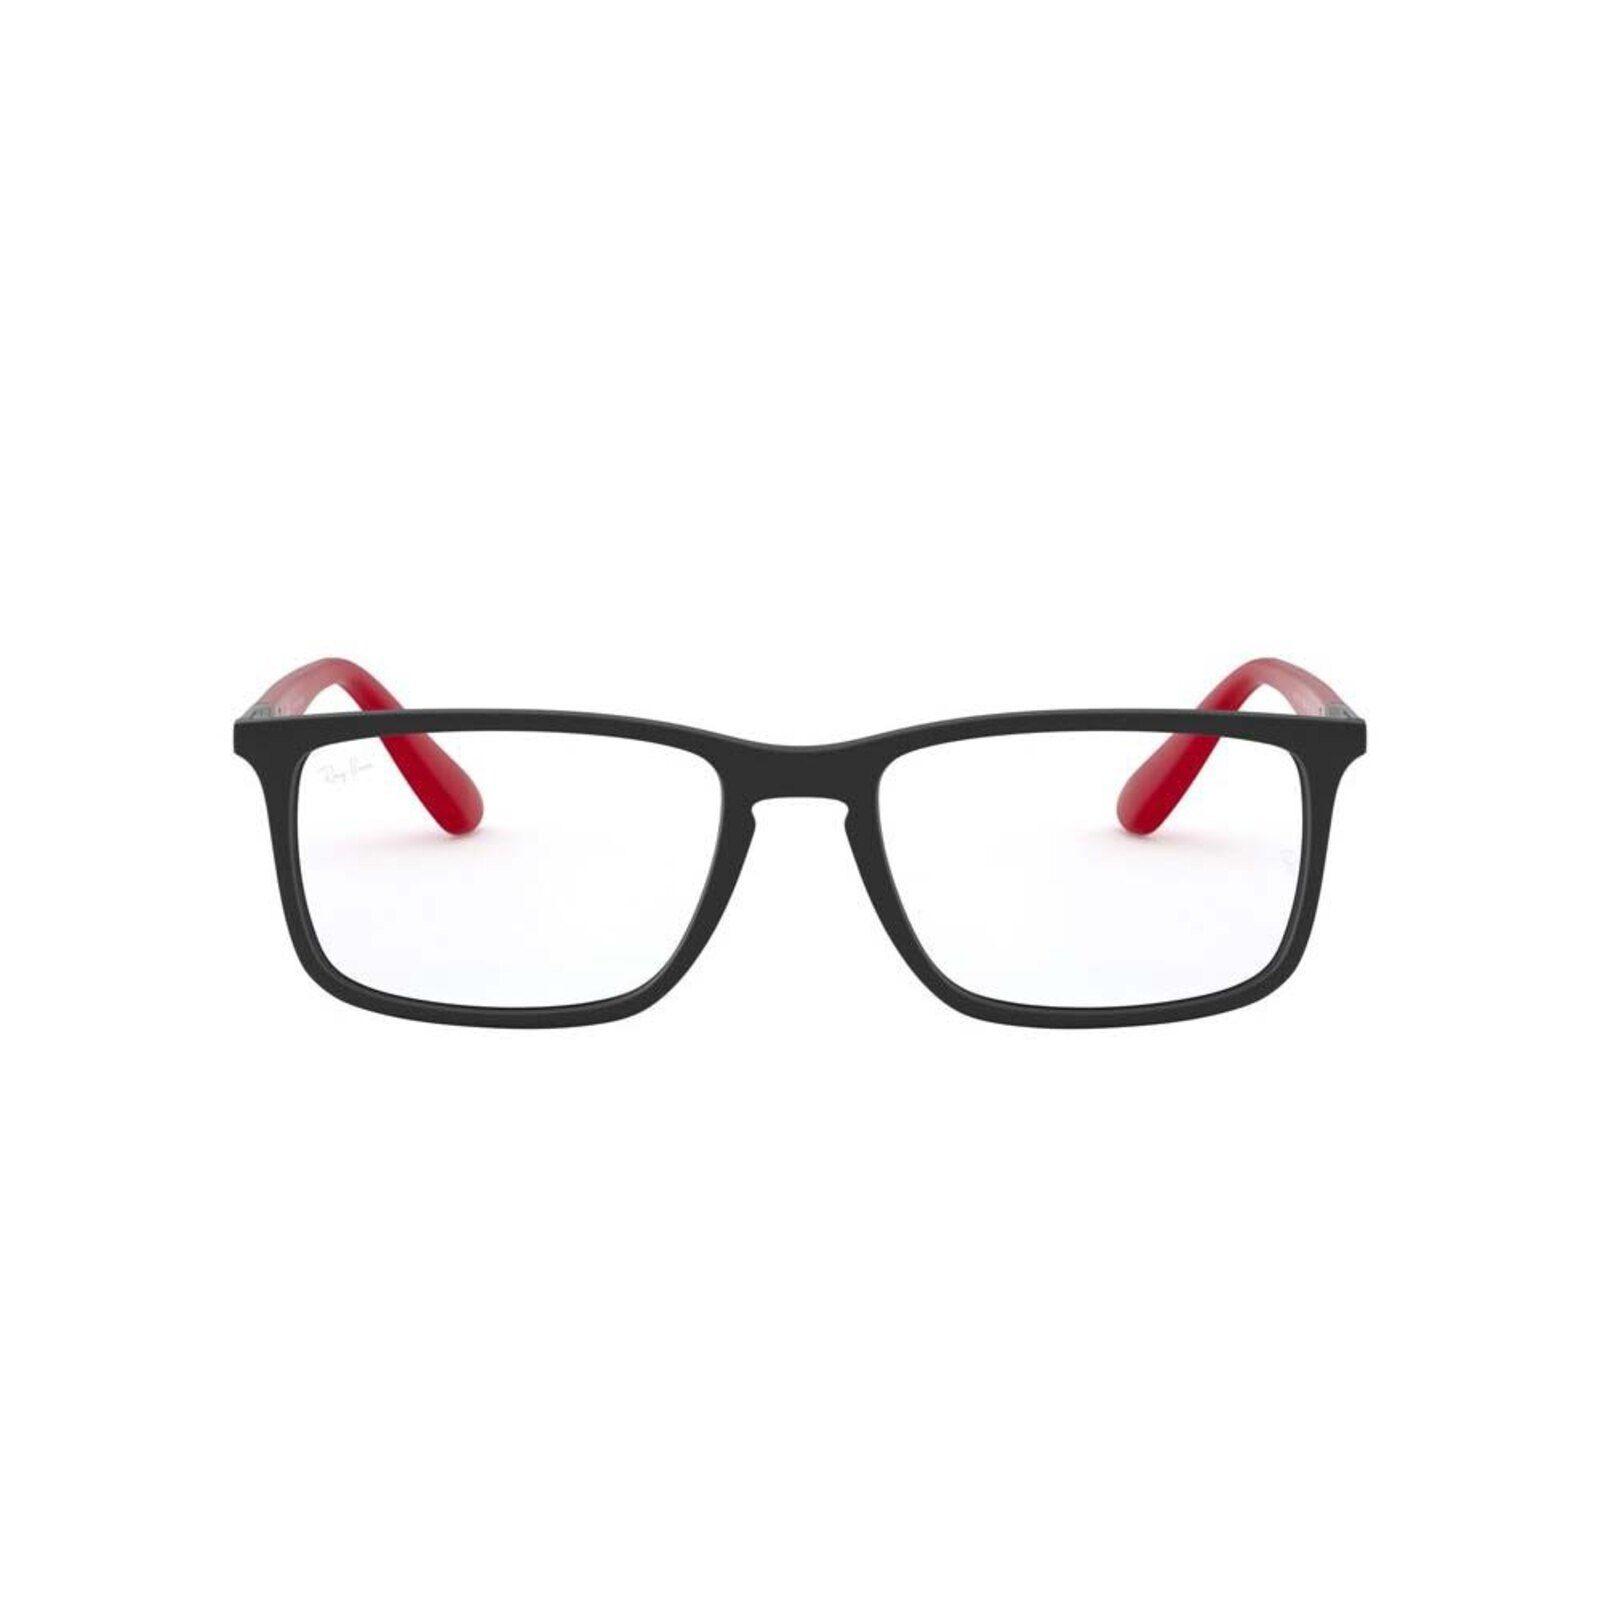 Oculos De Grau Ray Ban Rb7158 Ray Ban Brasil Em 2020 Oculos De